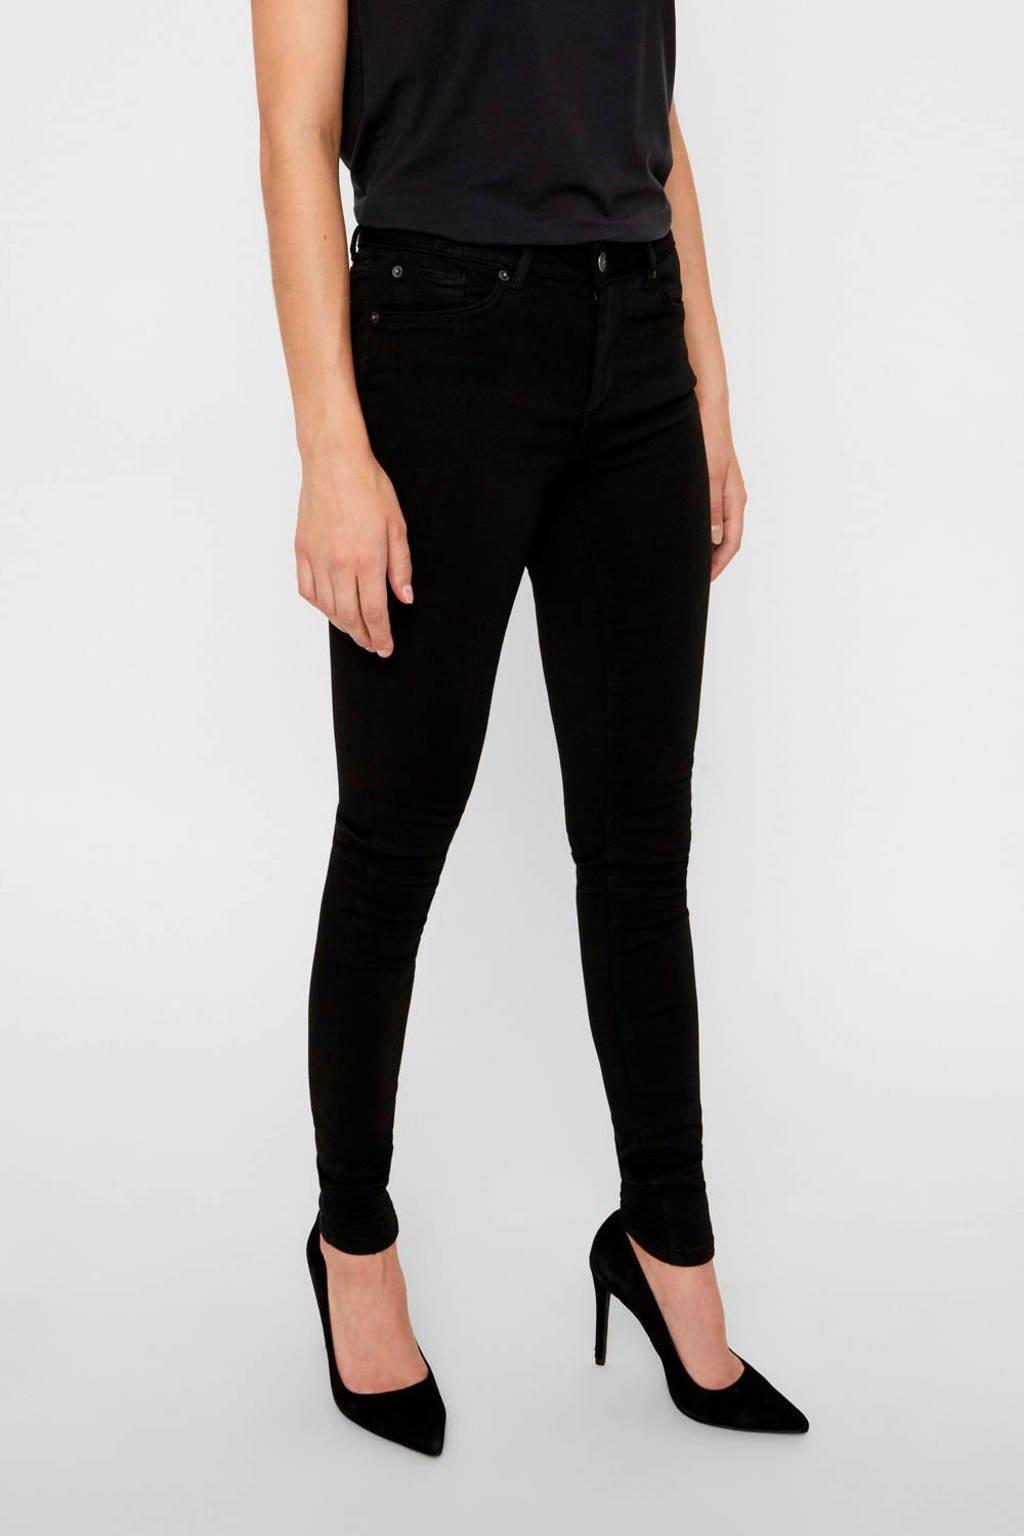 Hedendaags VERO MODA stay black skinny jeans   wehkamp AQ-93